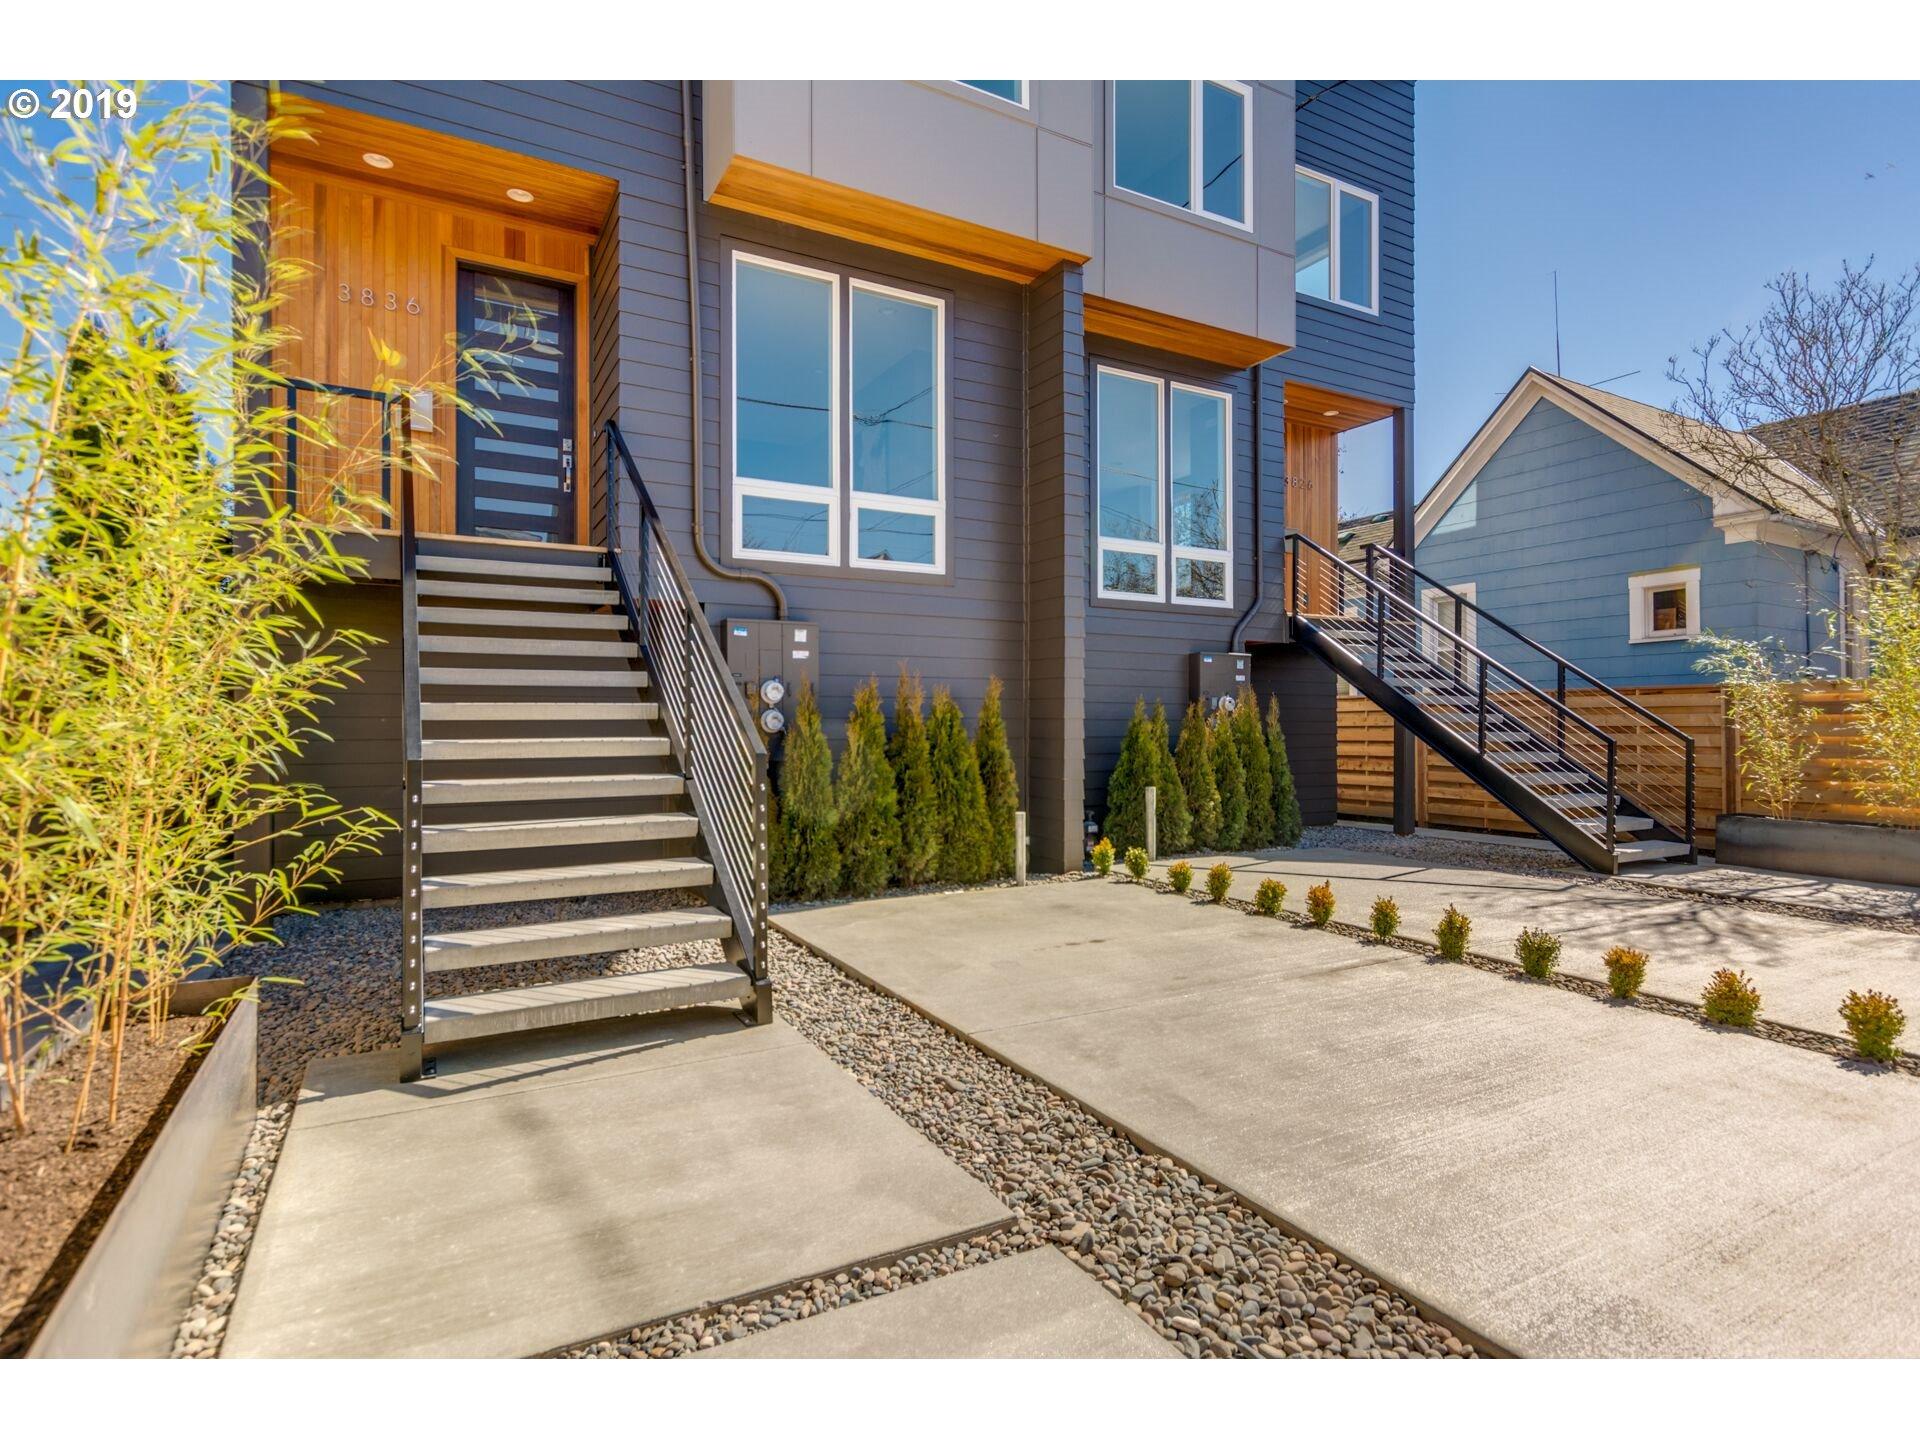 3826 NE GRAND AVE, Portland OR 97212